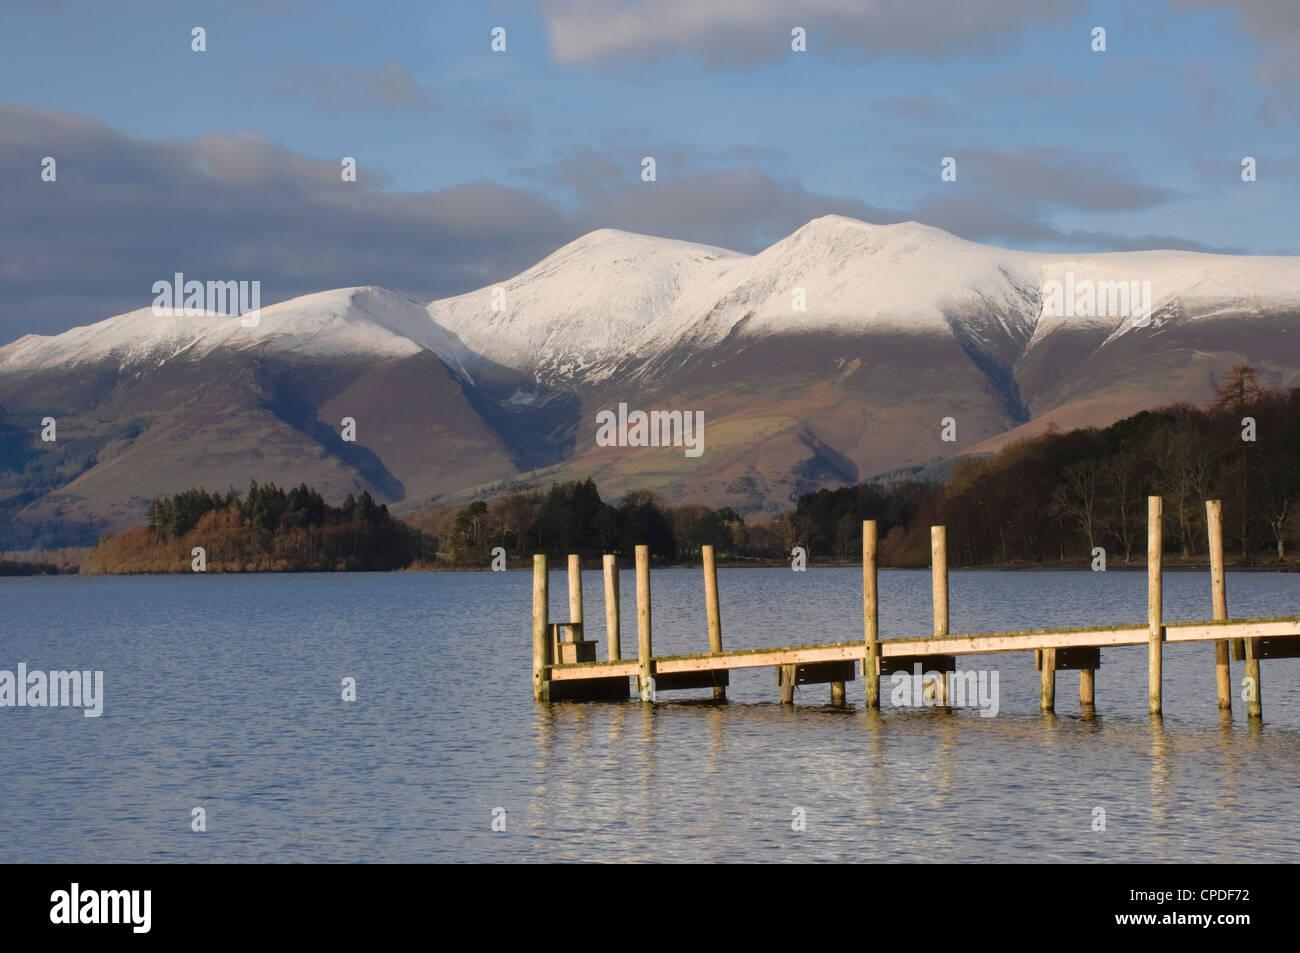 Across Lake Derwentwater to Skiddaw 3054ft, Keswick, Lake District Nationbal Park, Cumbria, England, United Kingdom, - Stock Image